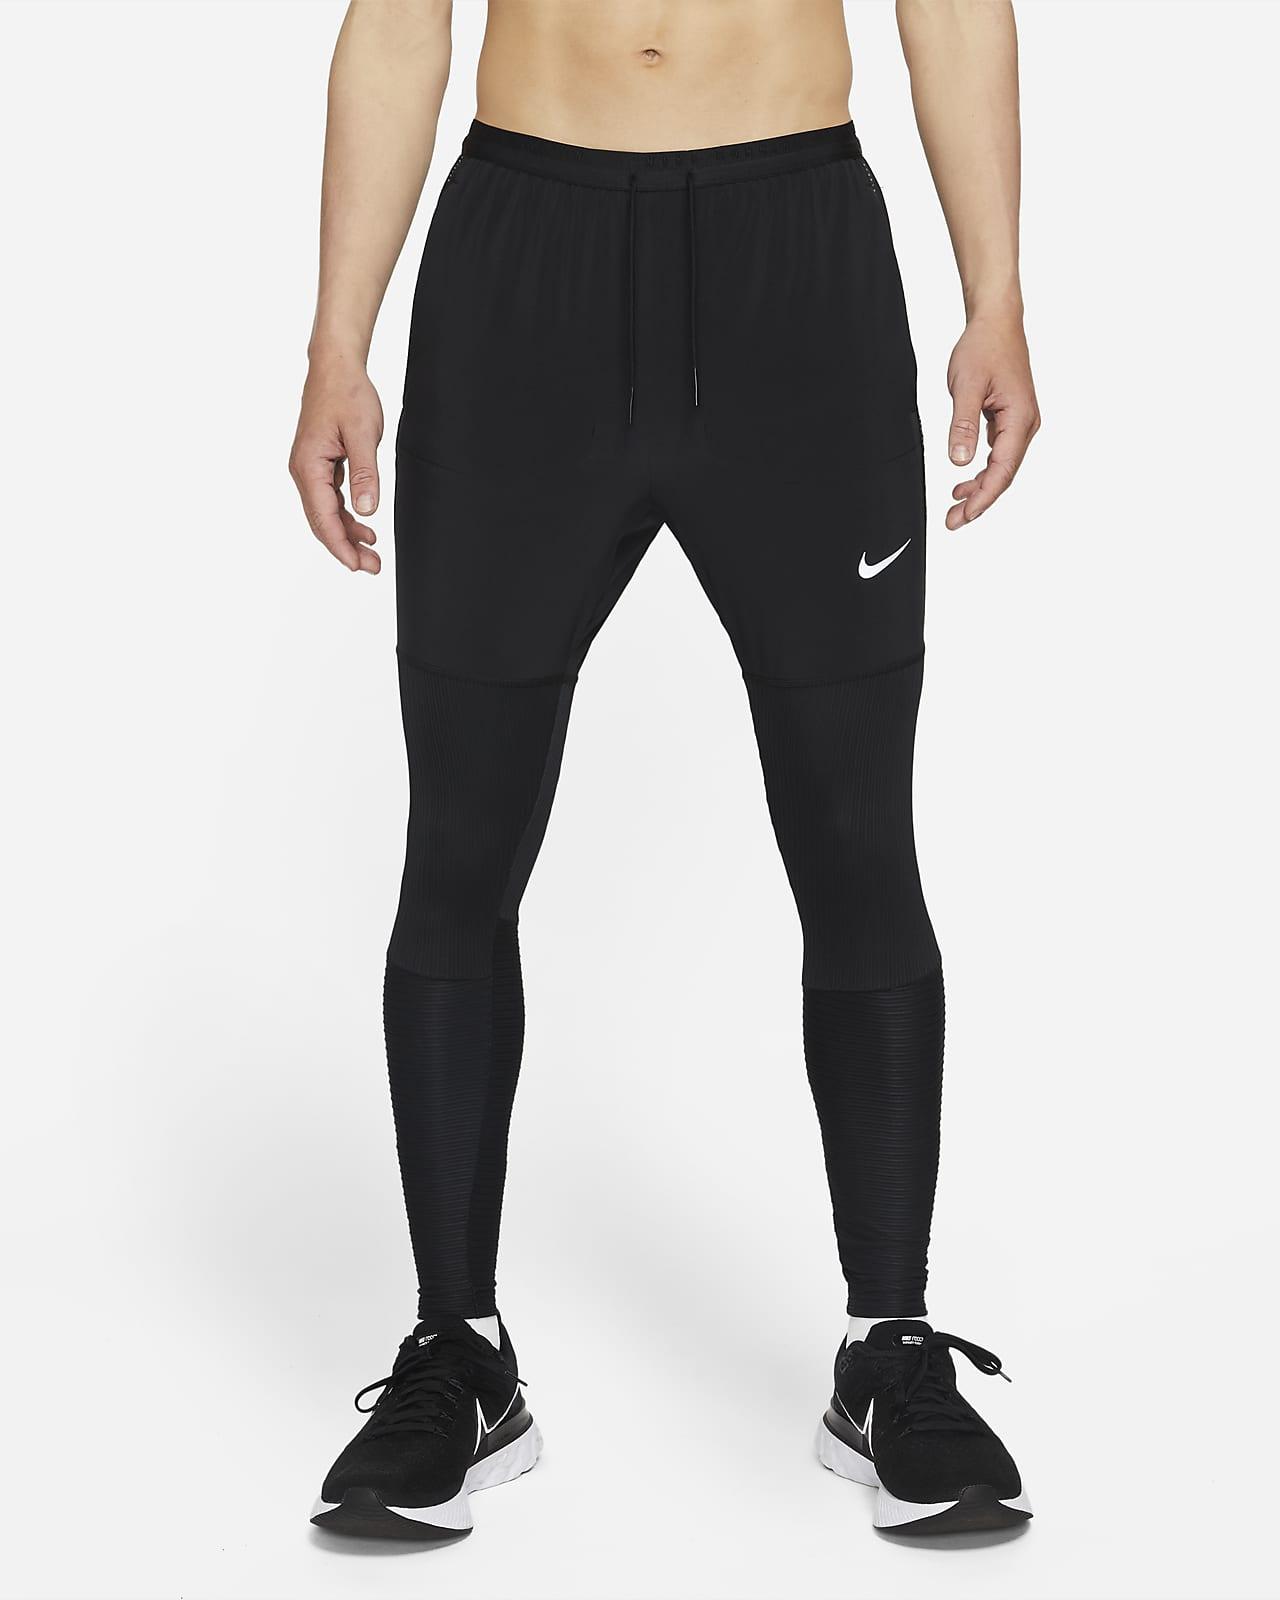 Nike Dri-FIT Phenom Run Division 男款全長式 Hybrid 跑步長褲